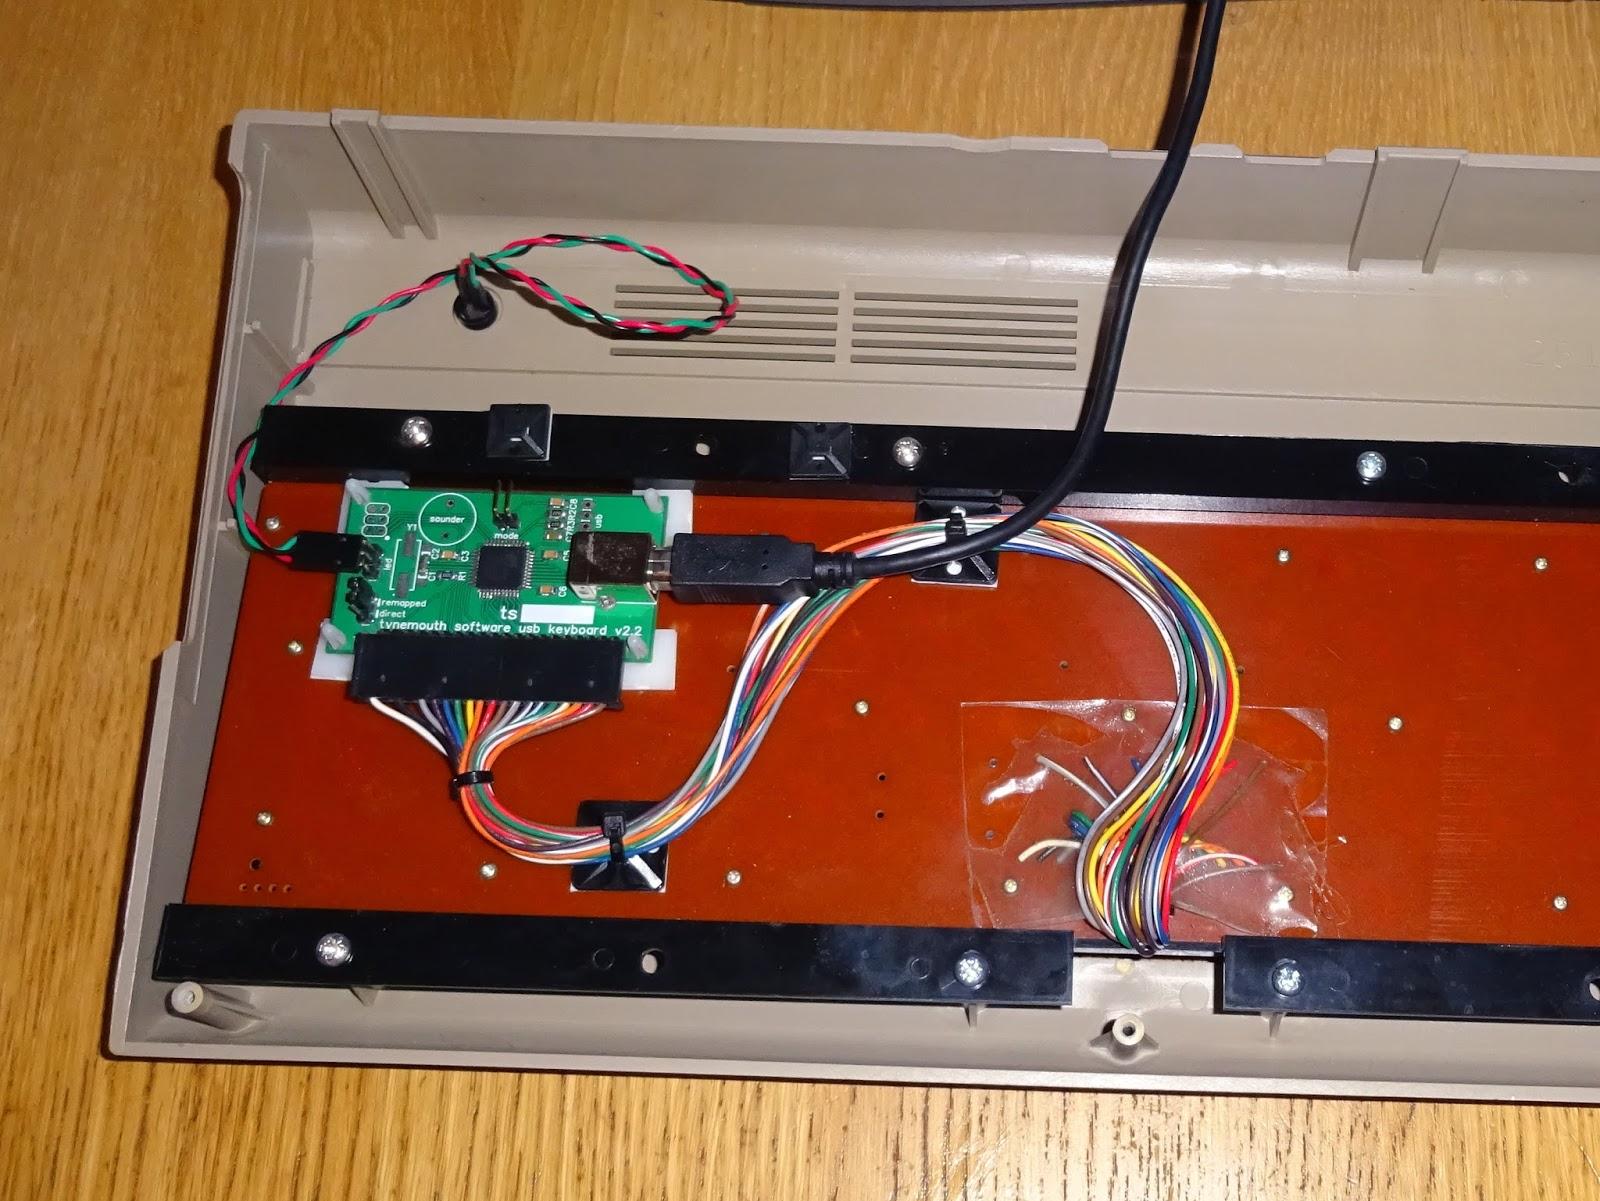 USB%2Bkeyboard%2Bcontroller%2Bon%2Bback%